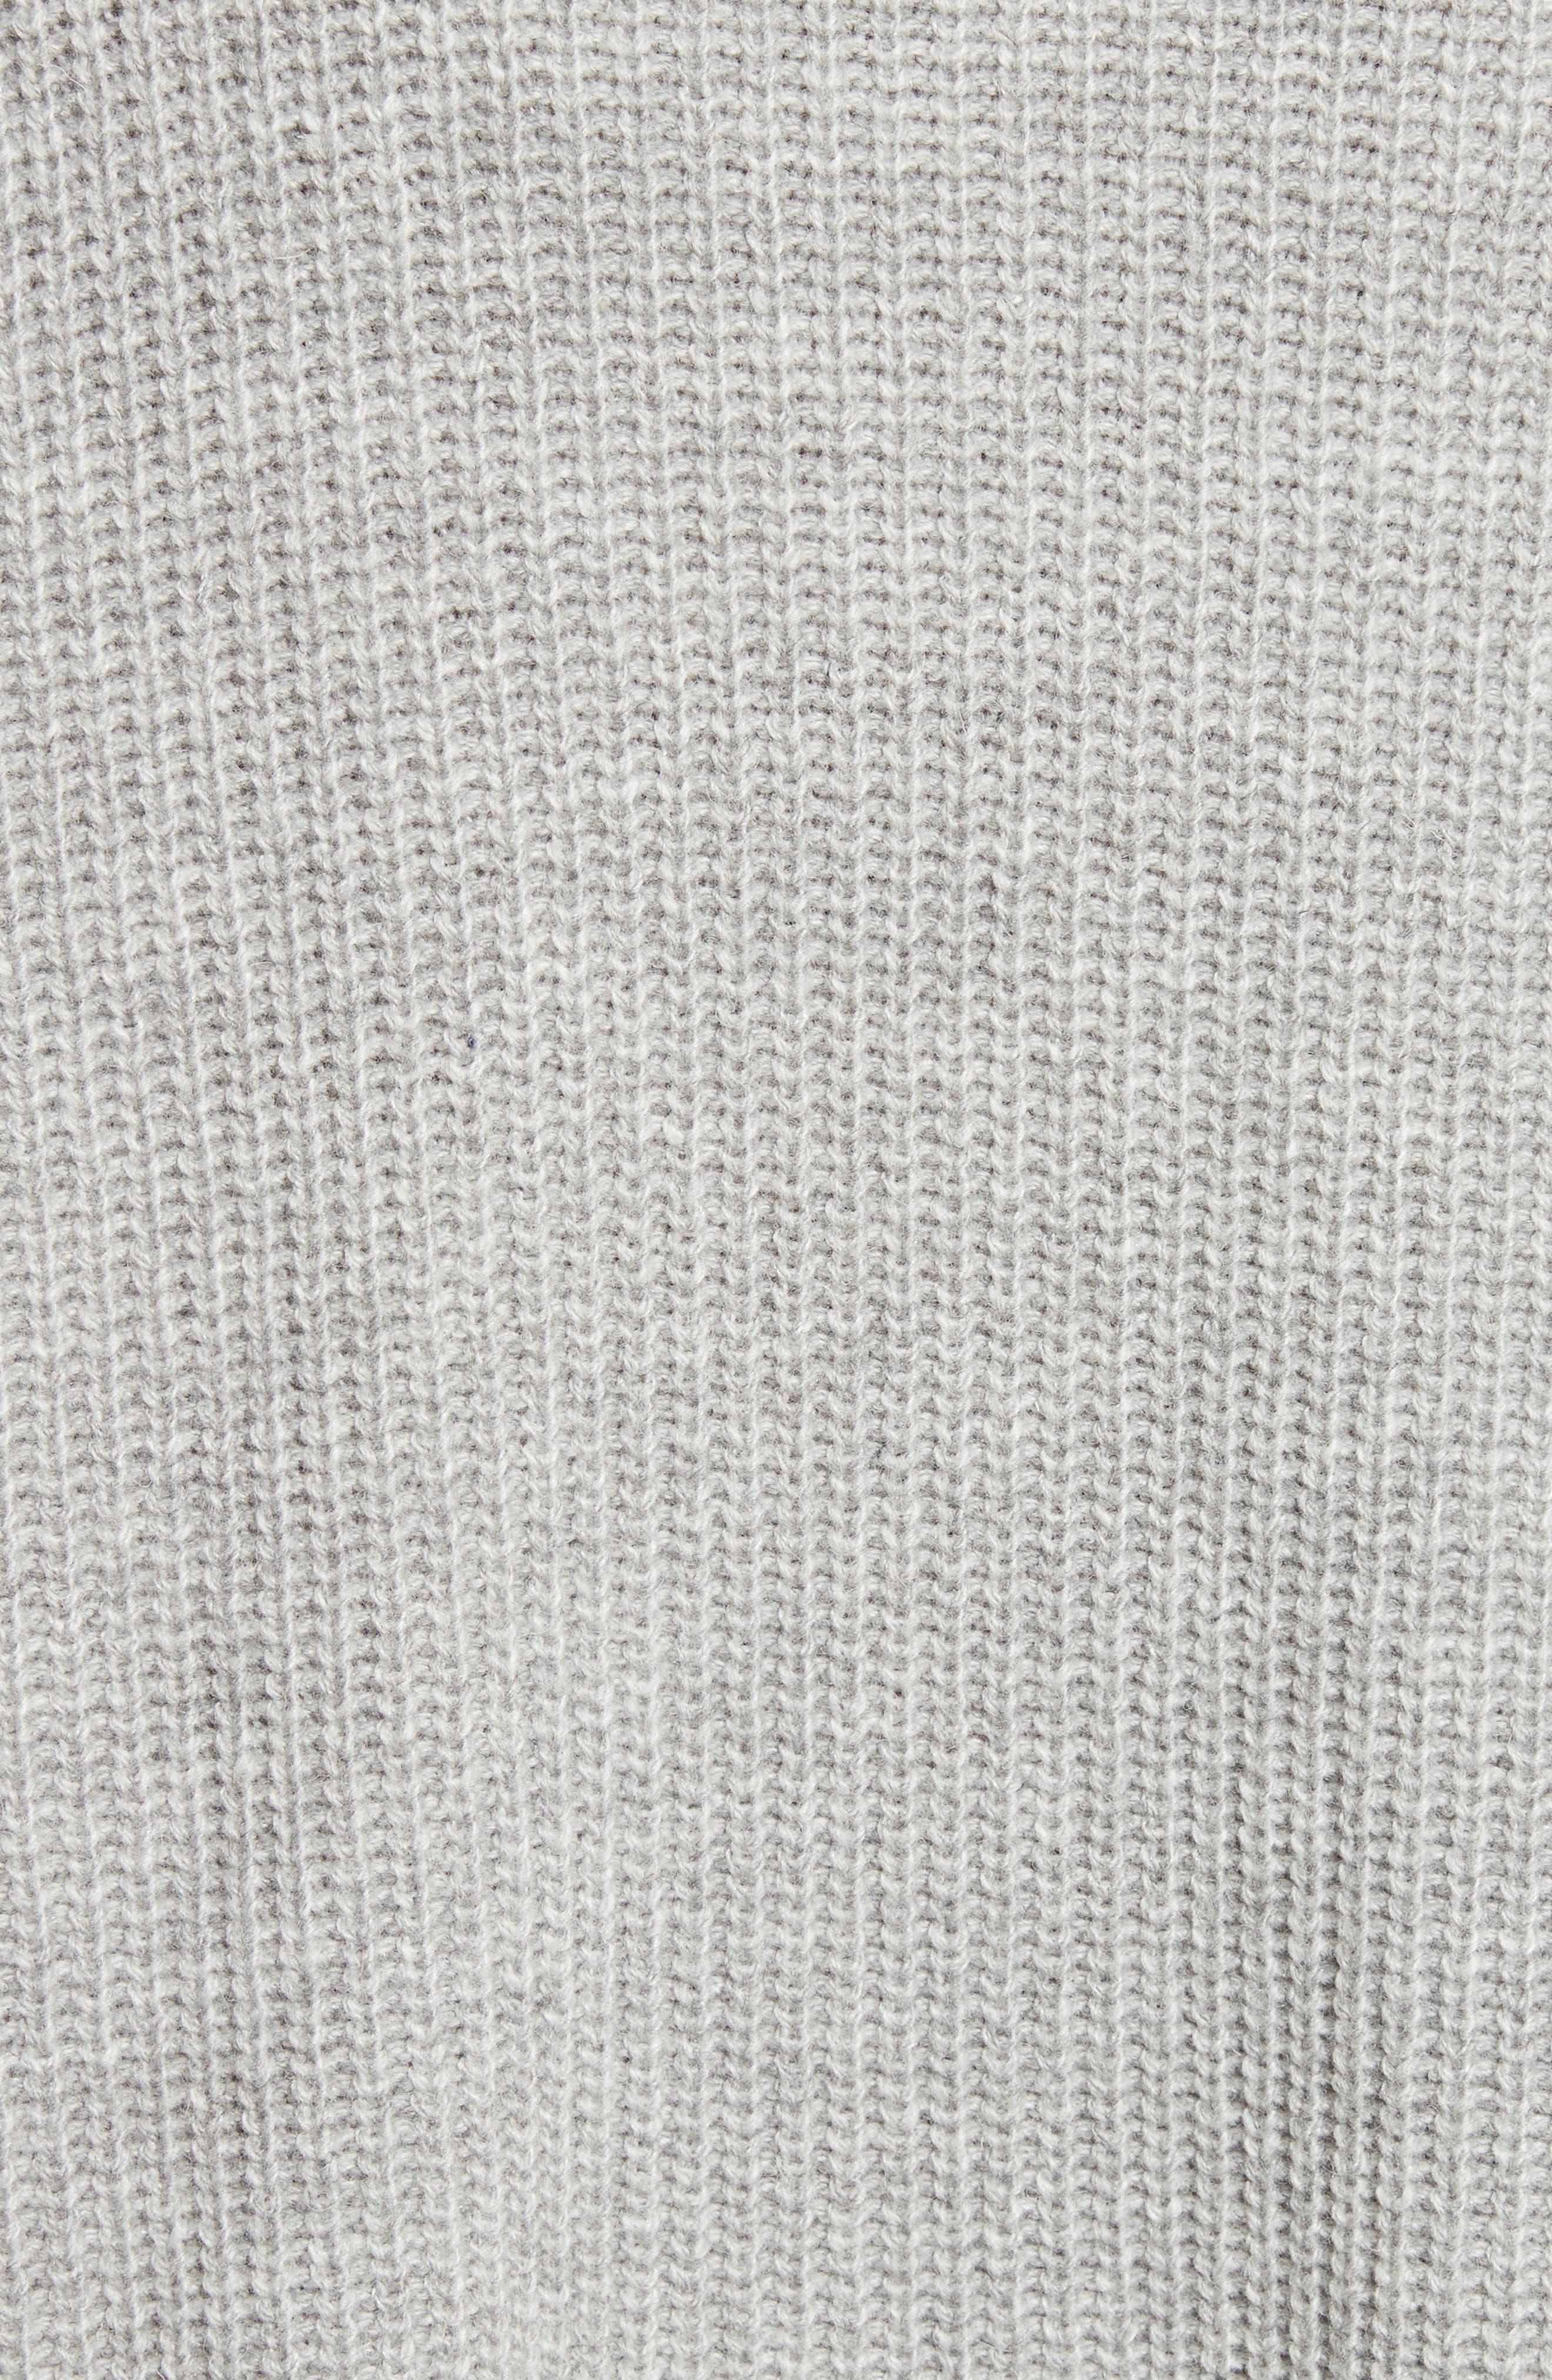 Oversize V-Neck Sweater,                             Alternate thumbnail 6, color,                             Gris